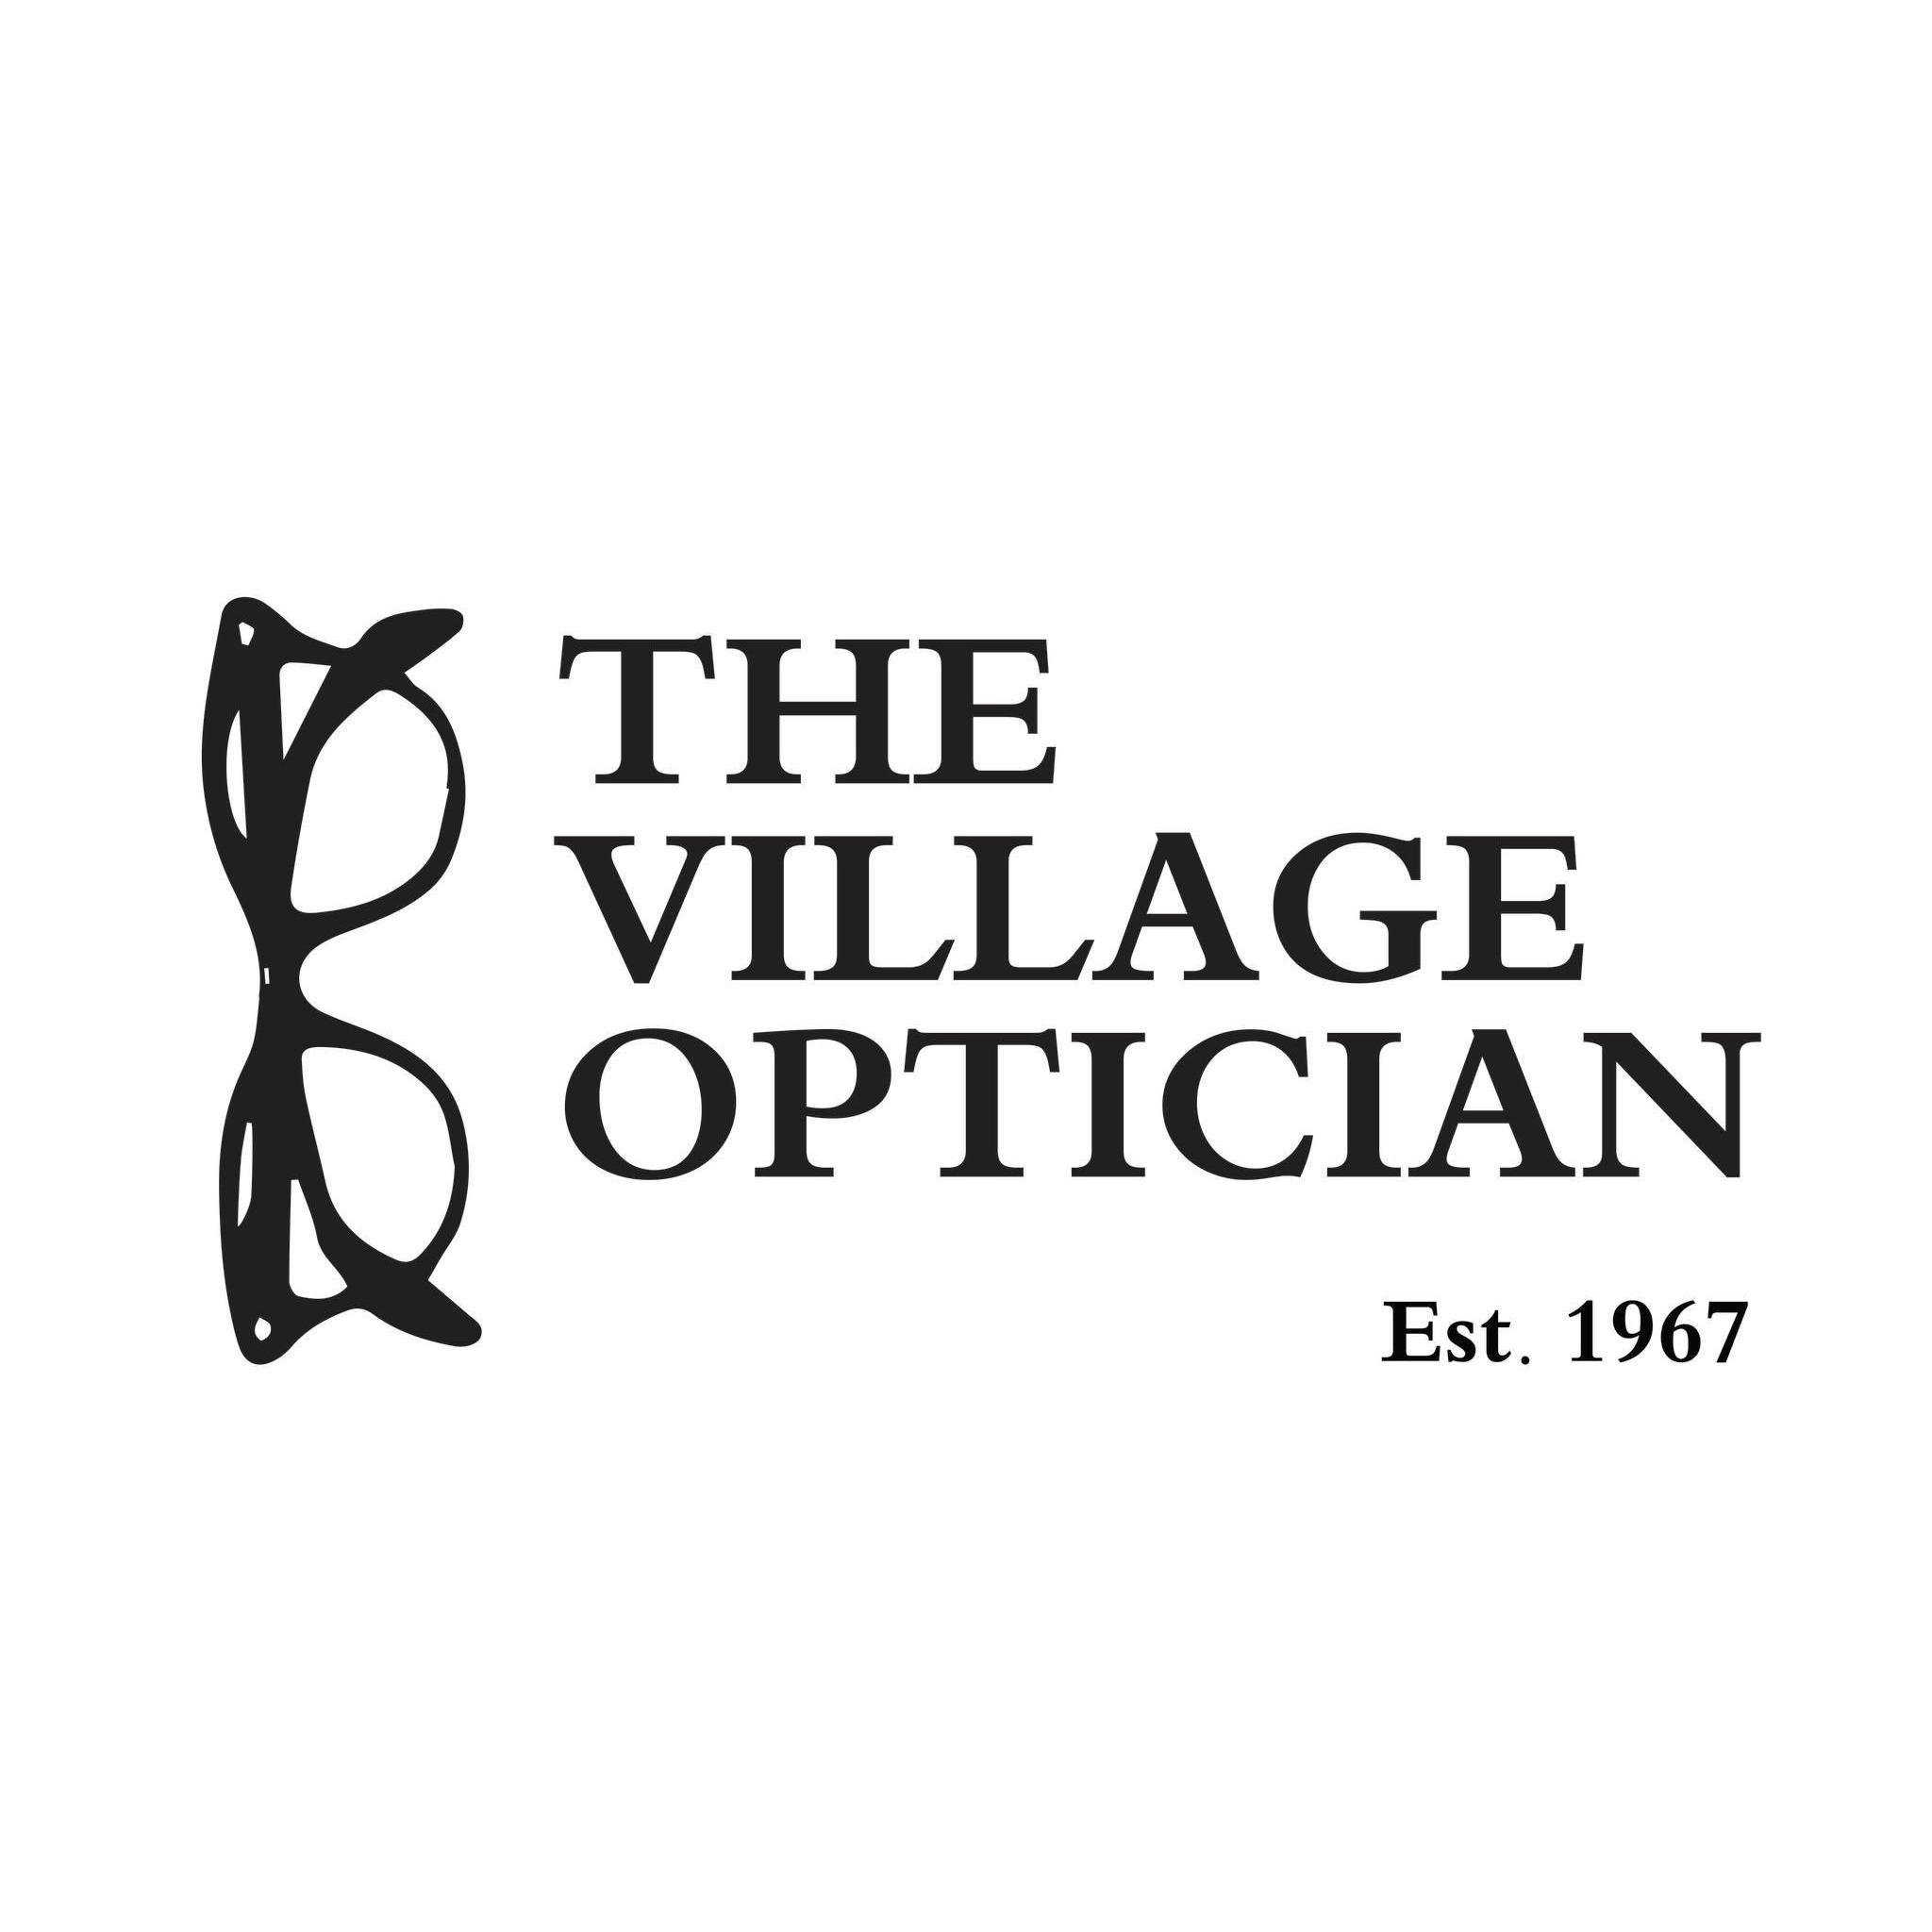 The Village Optician